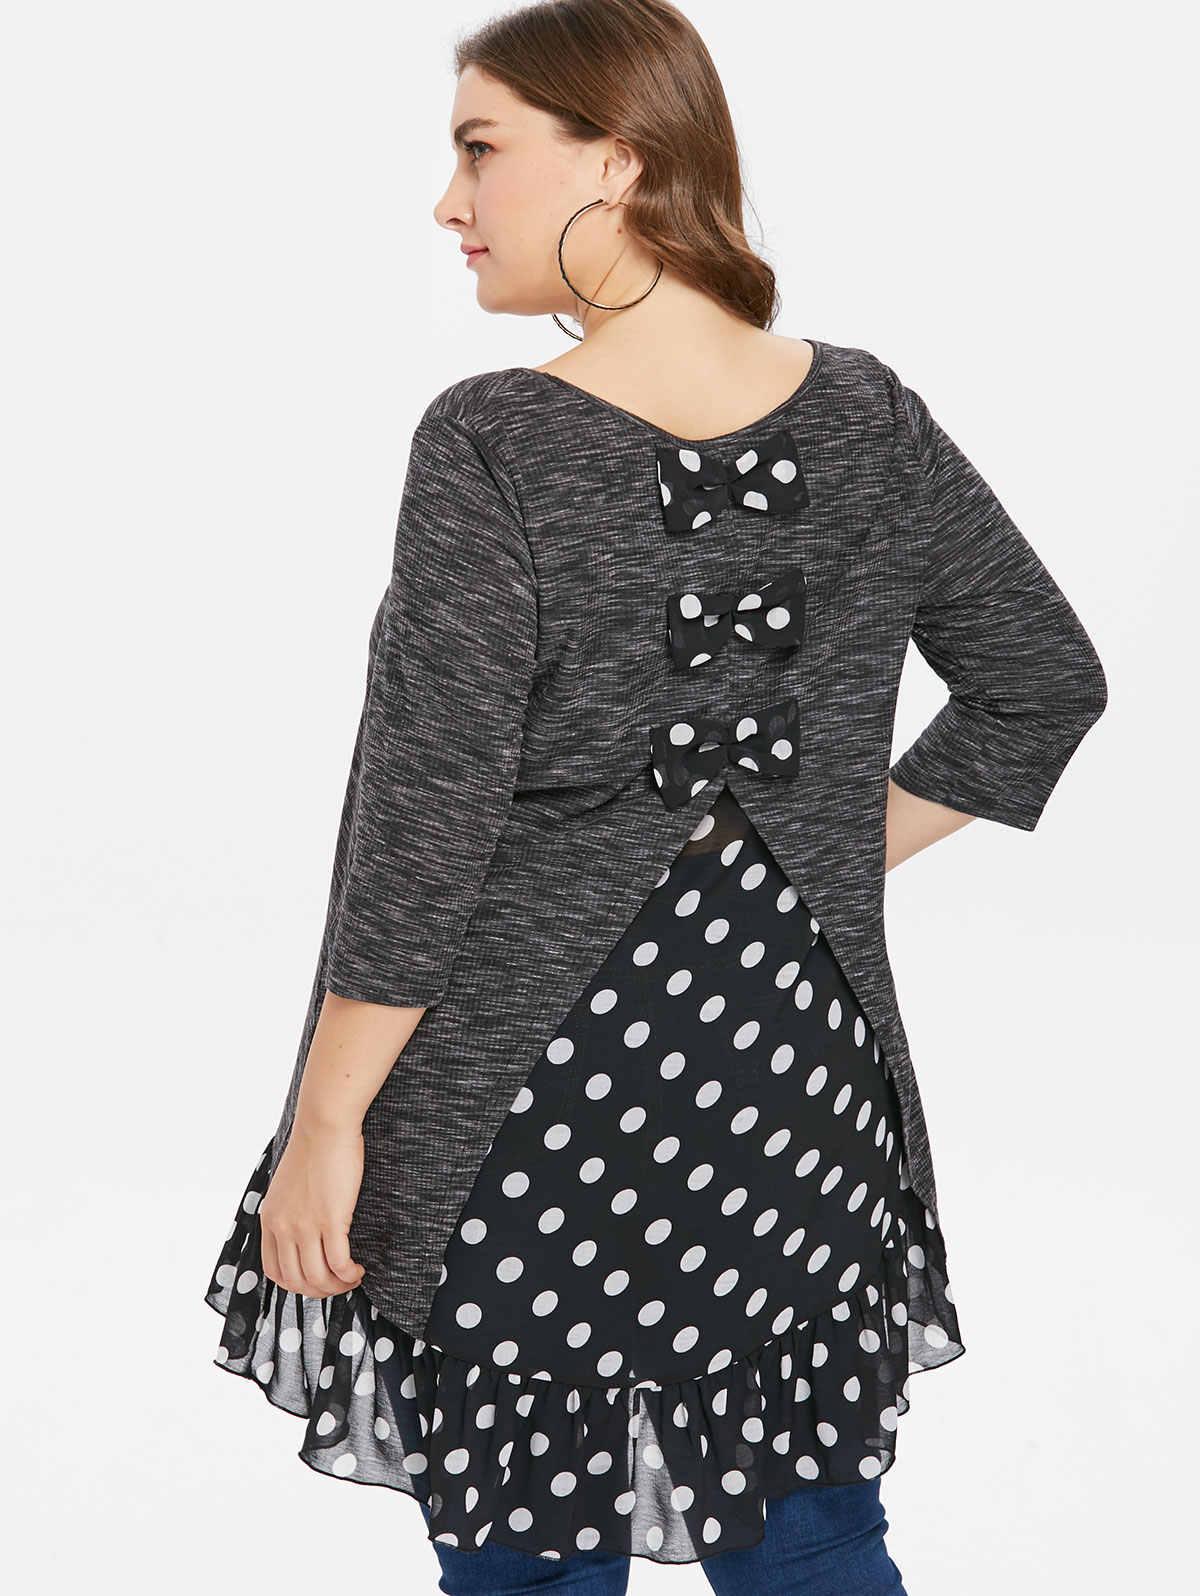 69f6fc29e8d Wipalo Plus Size 5XL Polka Dot Three Quarter Sleeve T-Shirt Bow Embellished  Asymmetrical Hem